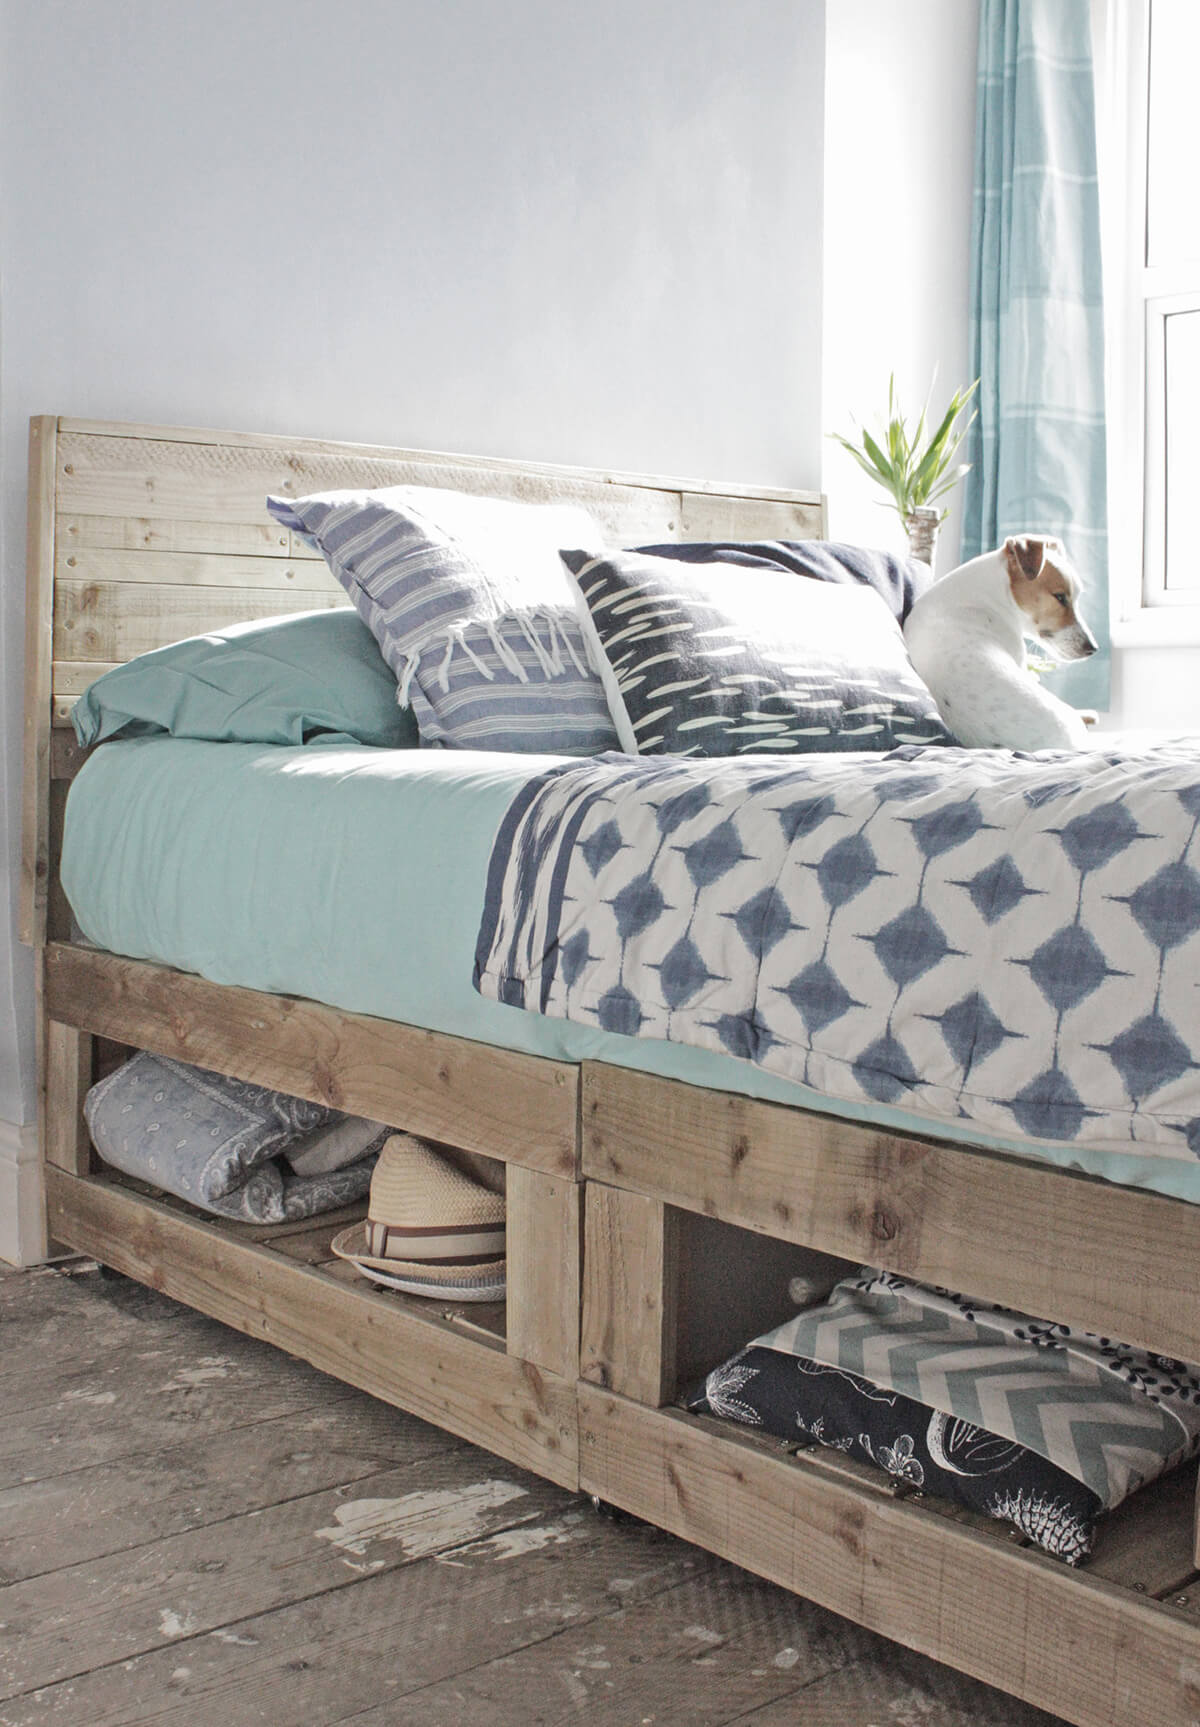 Divan Bed Bottom Storage Hack